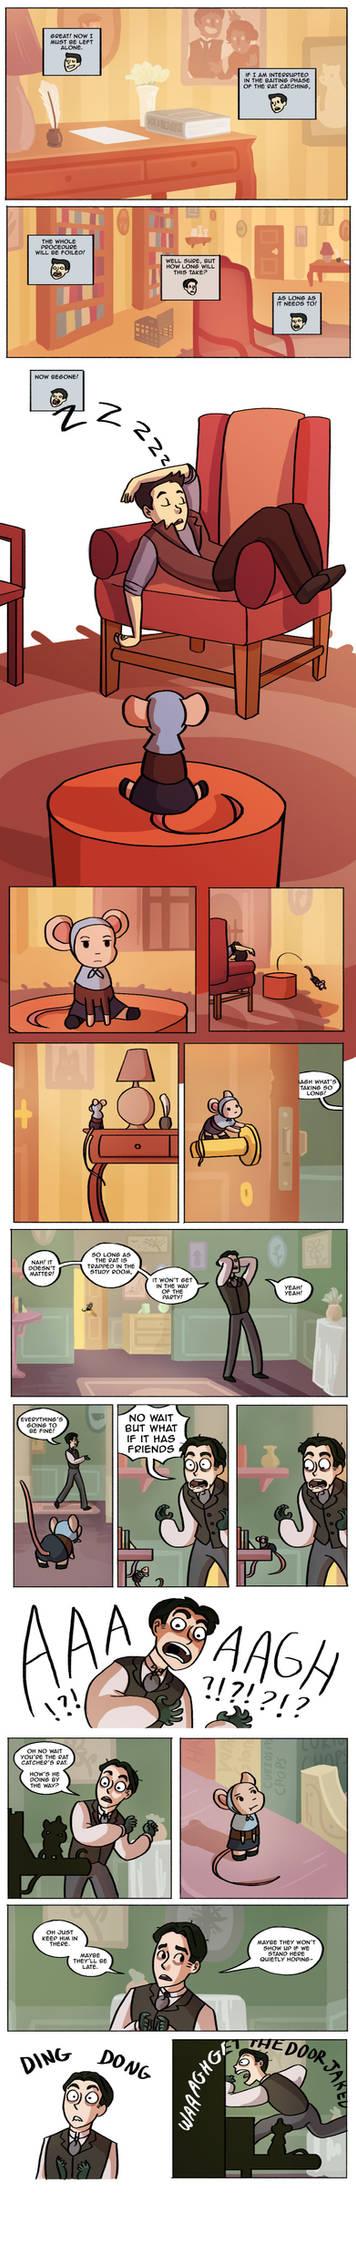 Detective Mimi- page 3